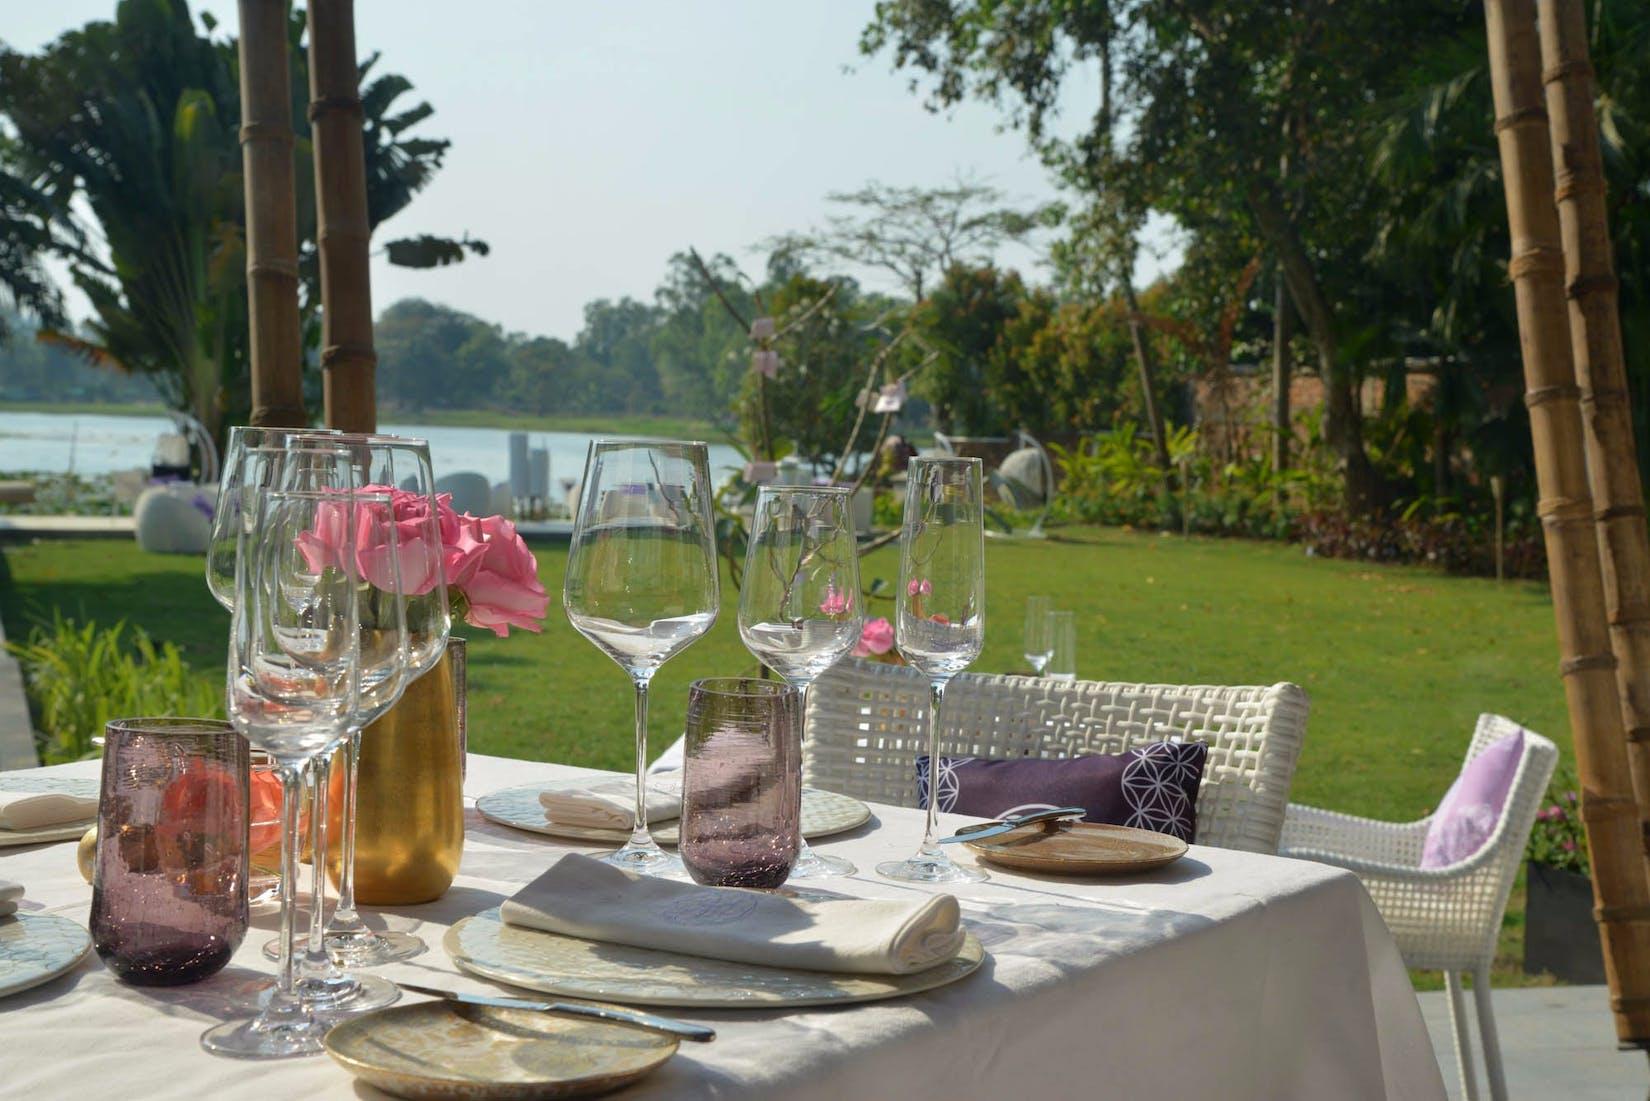 Seeds Restaurant & Lounge | yathar